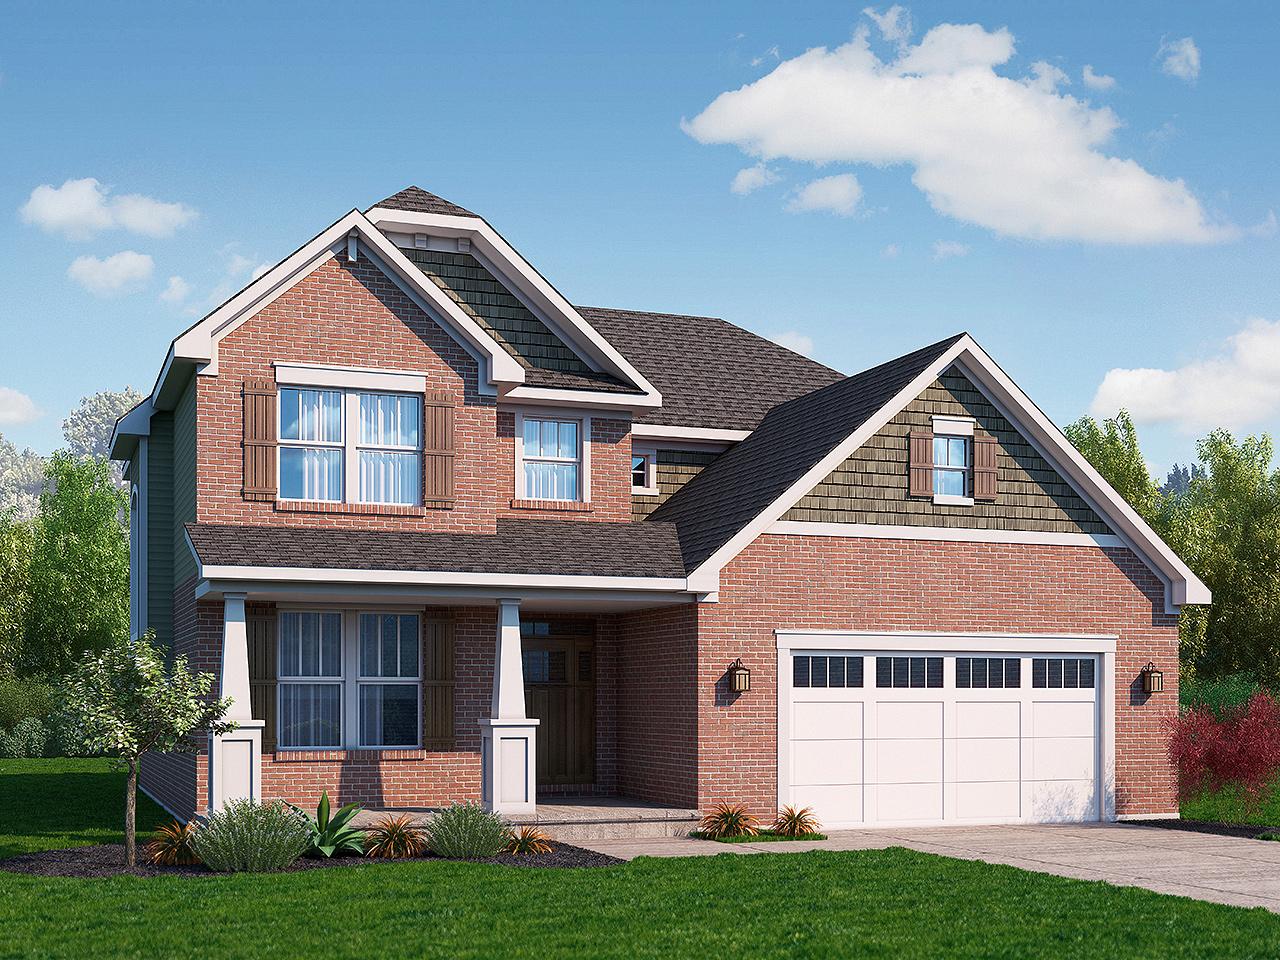 Brick Ranch Rendering Home Design Carbondale Brick Home